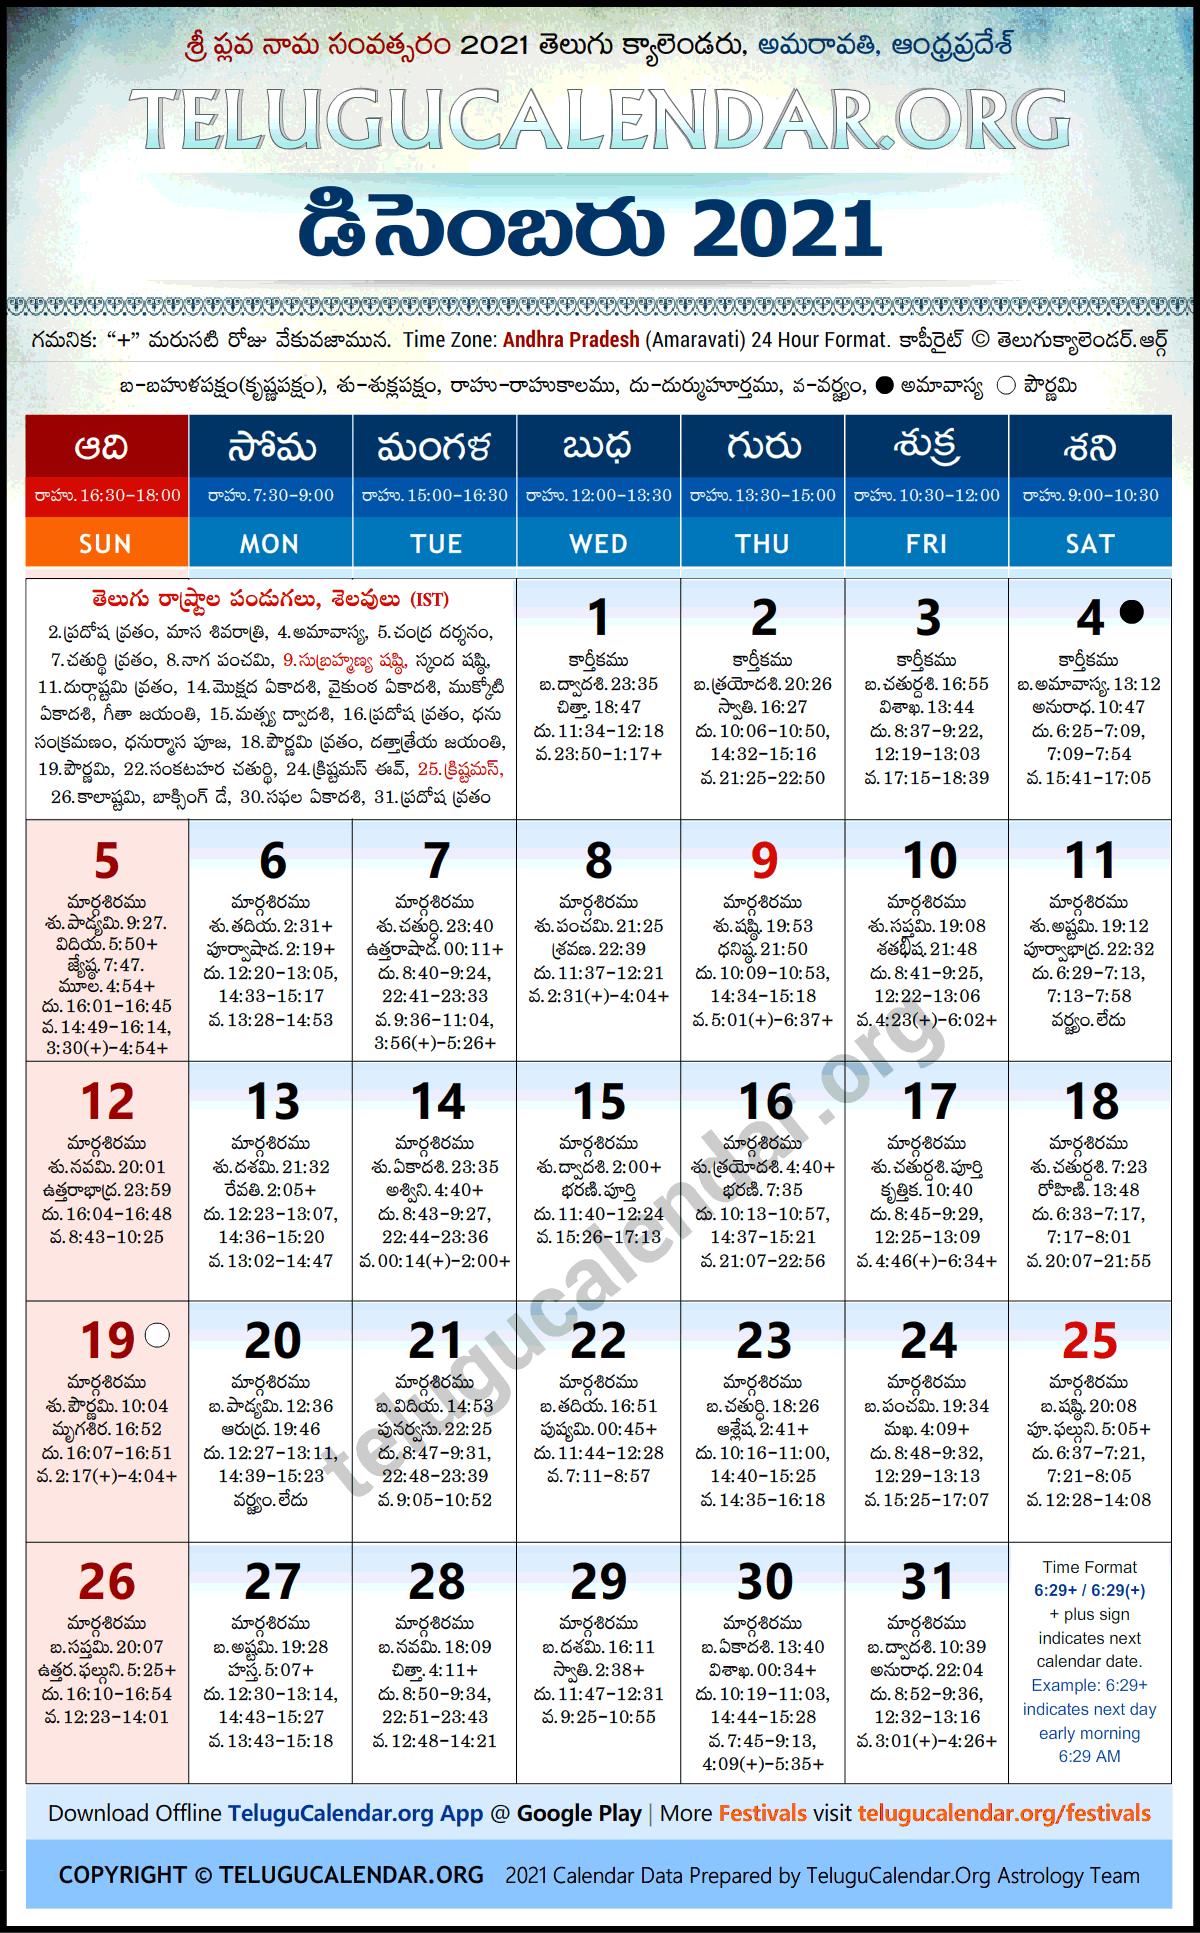 Andhra Pradesh 2021 December Telugu Calendar Festivals & Holidays